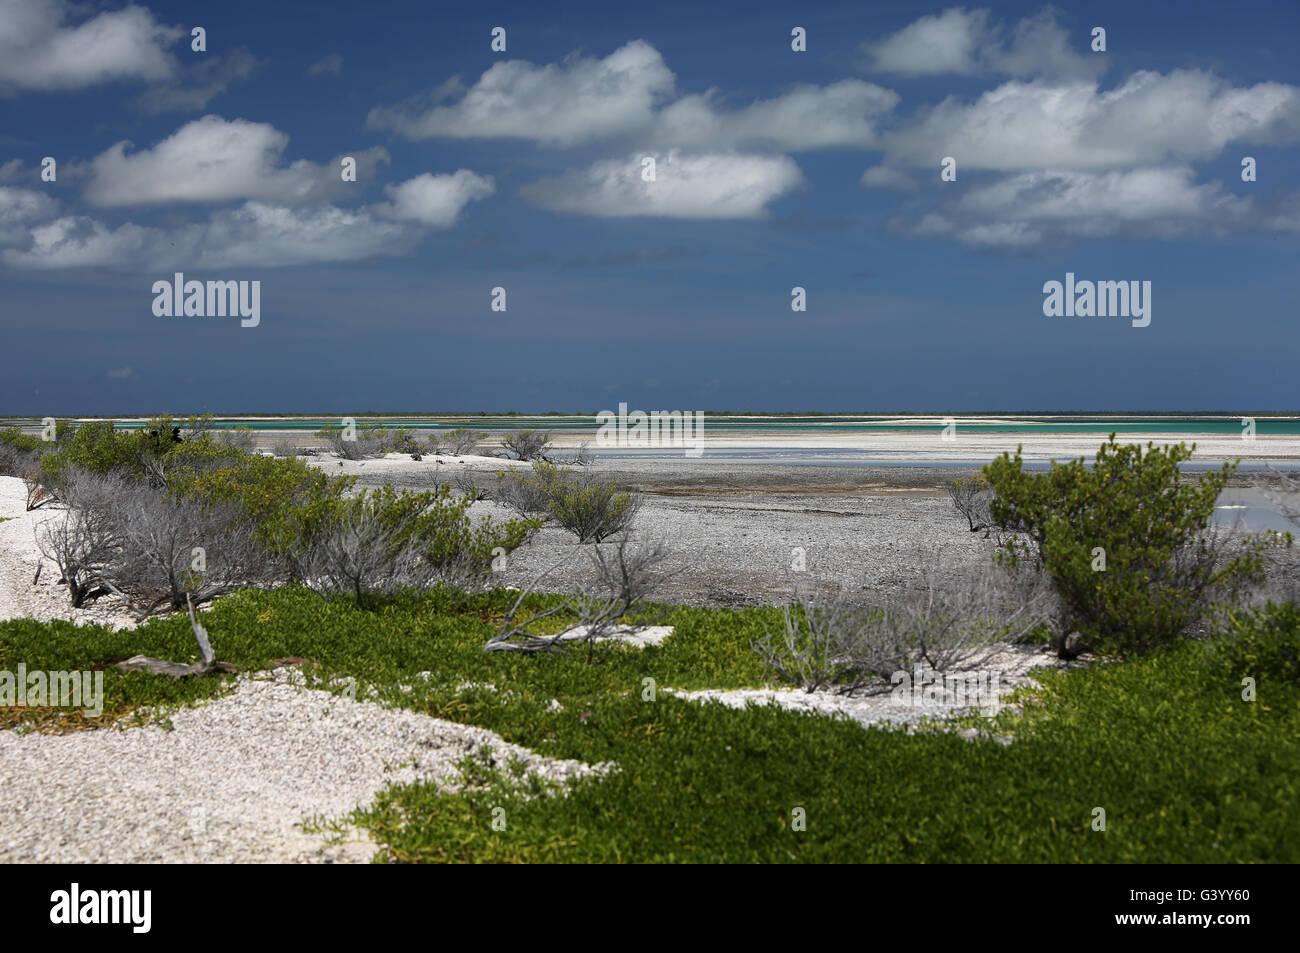 Flats in lagoon, Christmas Island, Kiribati - Stock Image